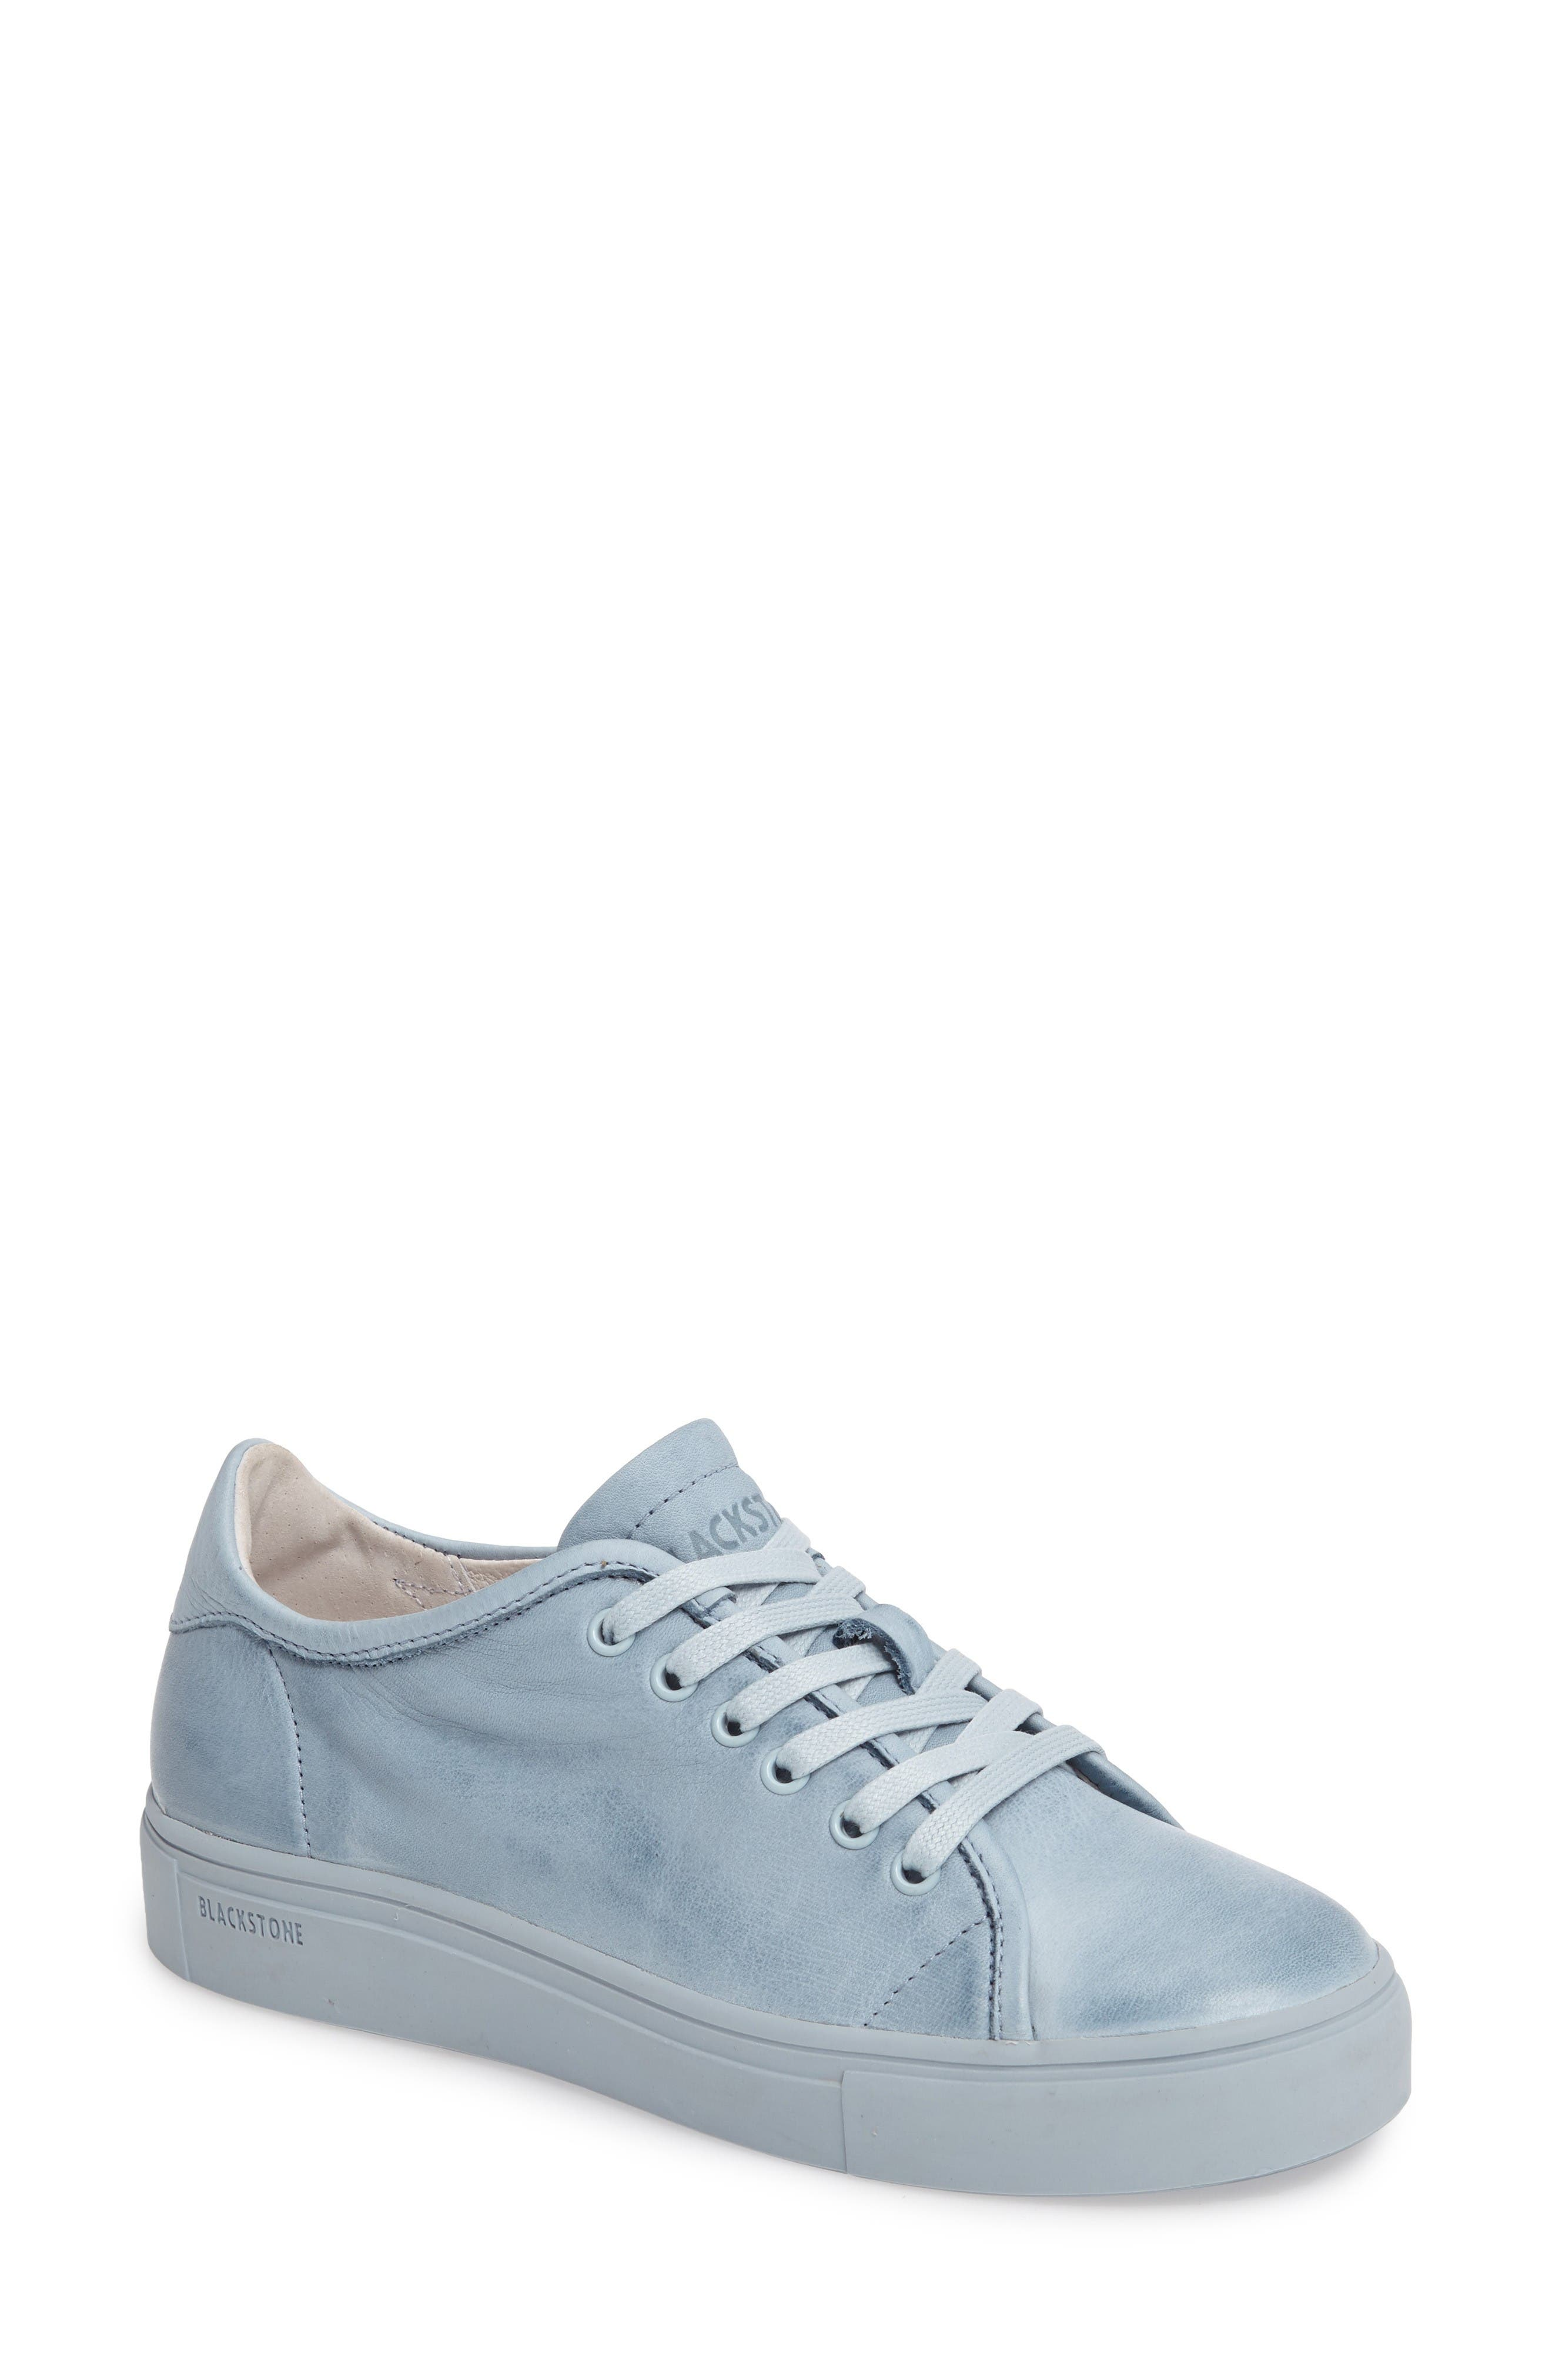 Main Image - Blackstone NL33 Sneaker (Women)